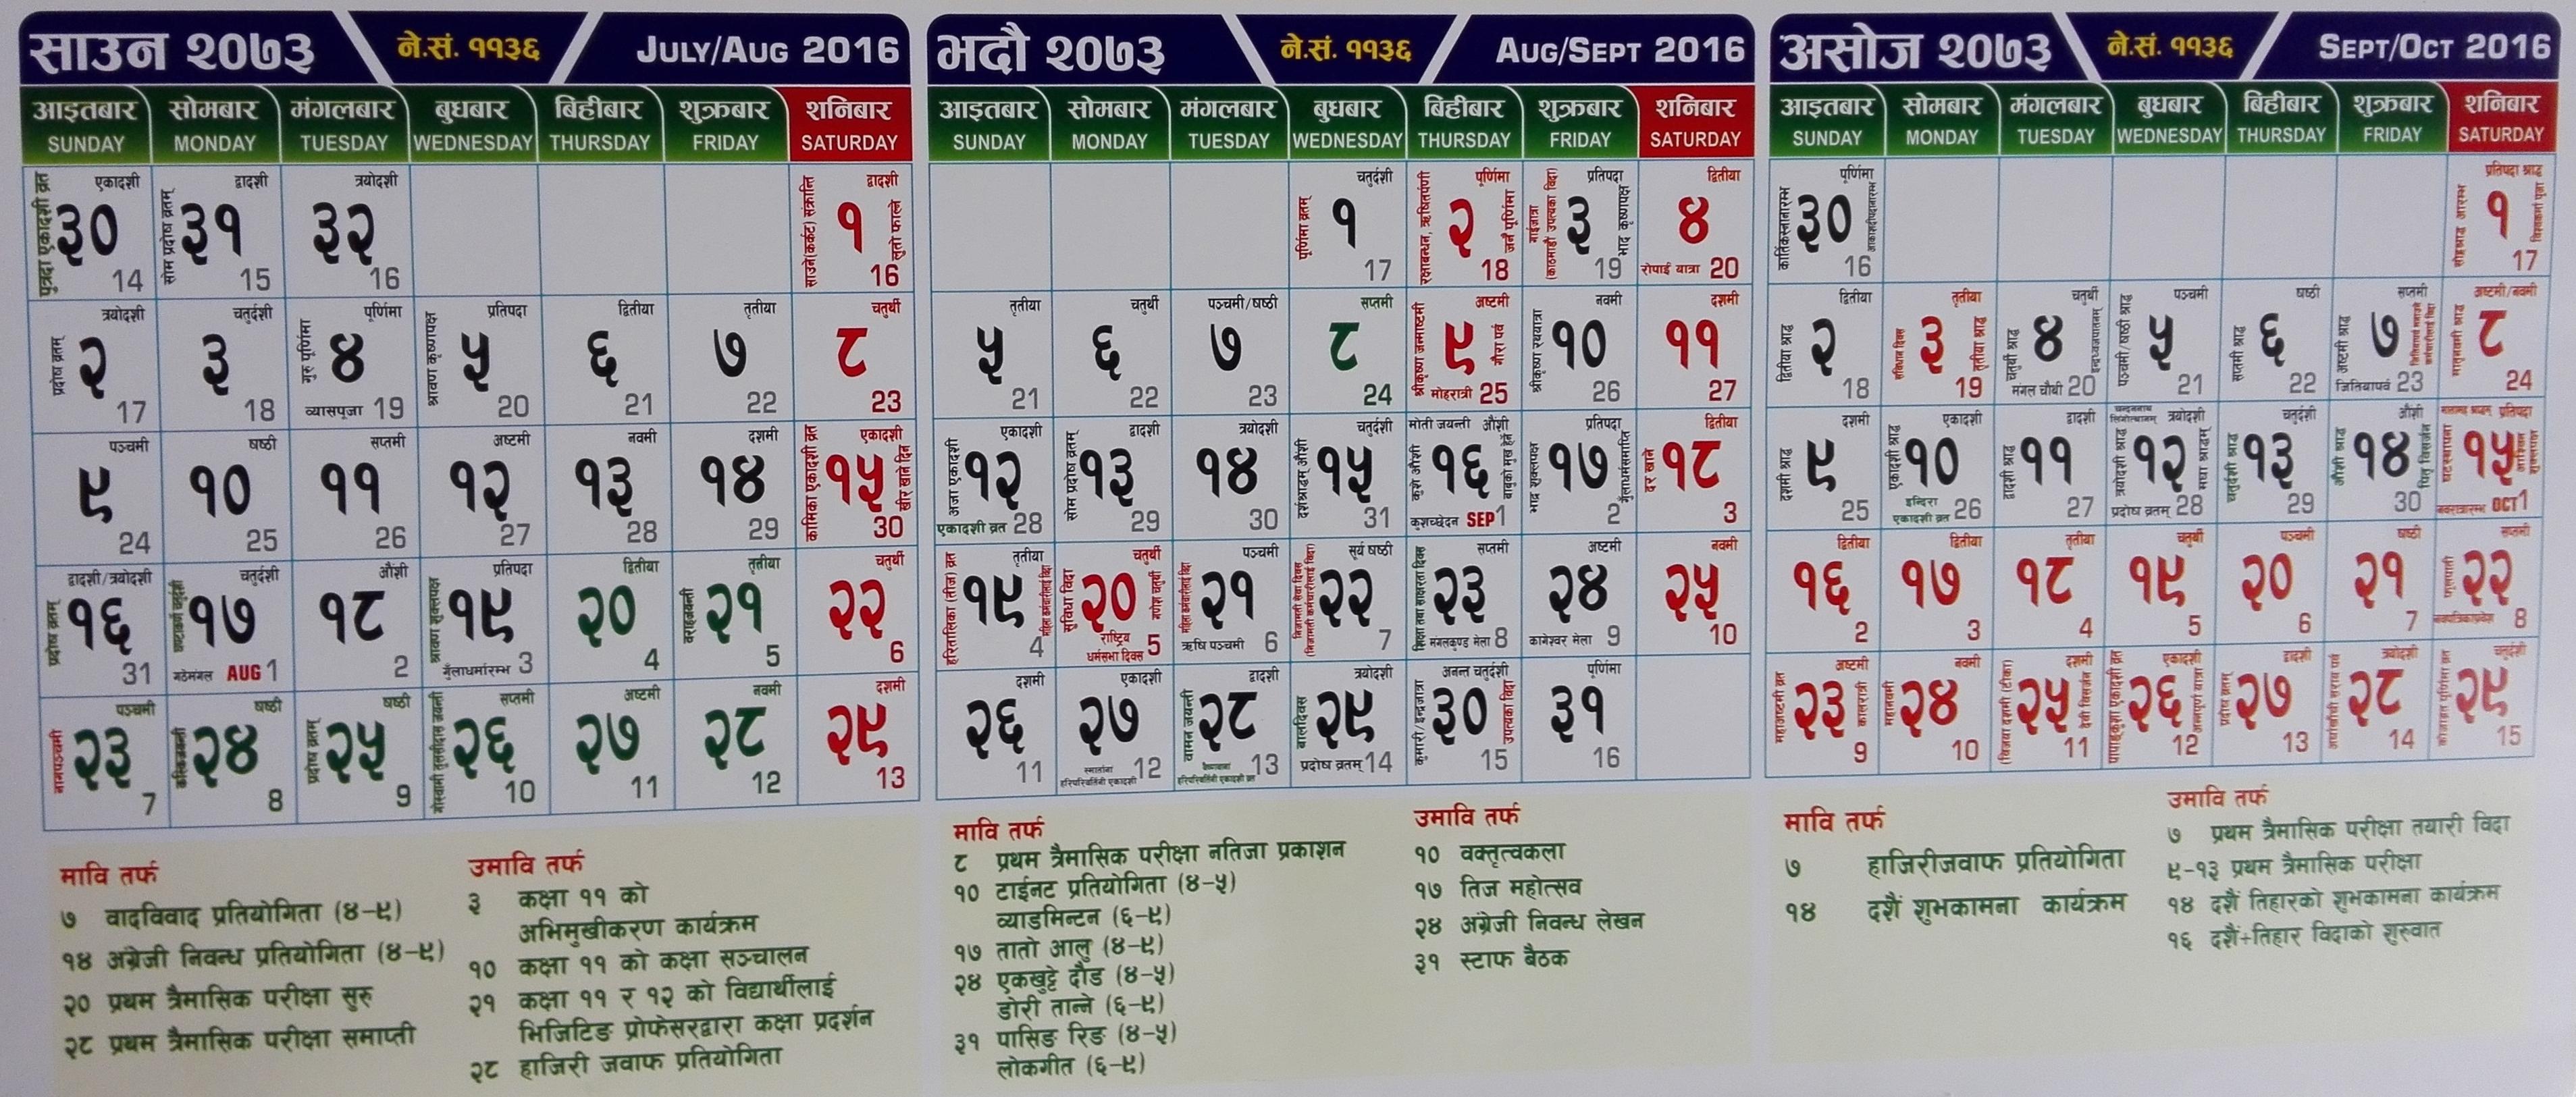 Calendar Shrawan- Ashwin « Janakalyan Higher Secondary School